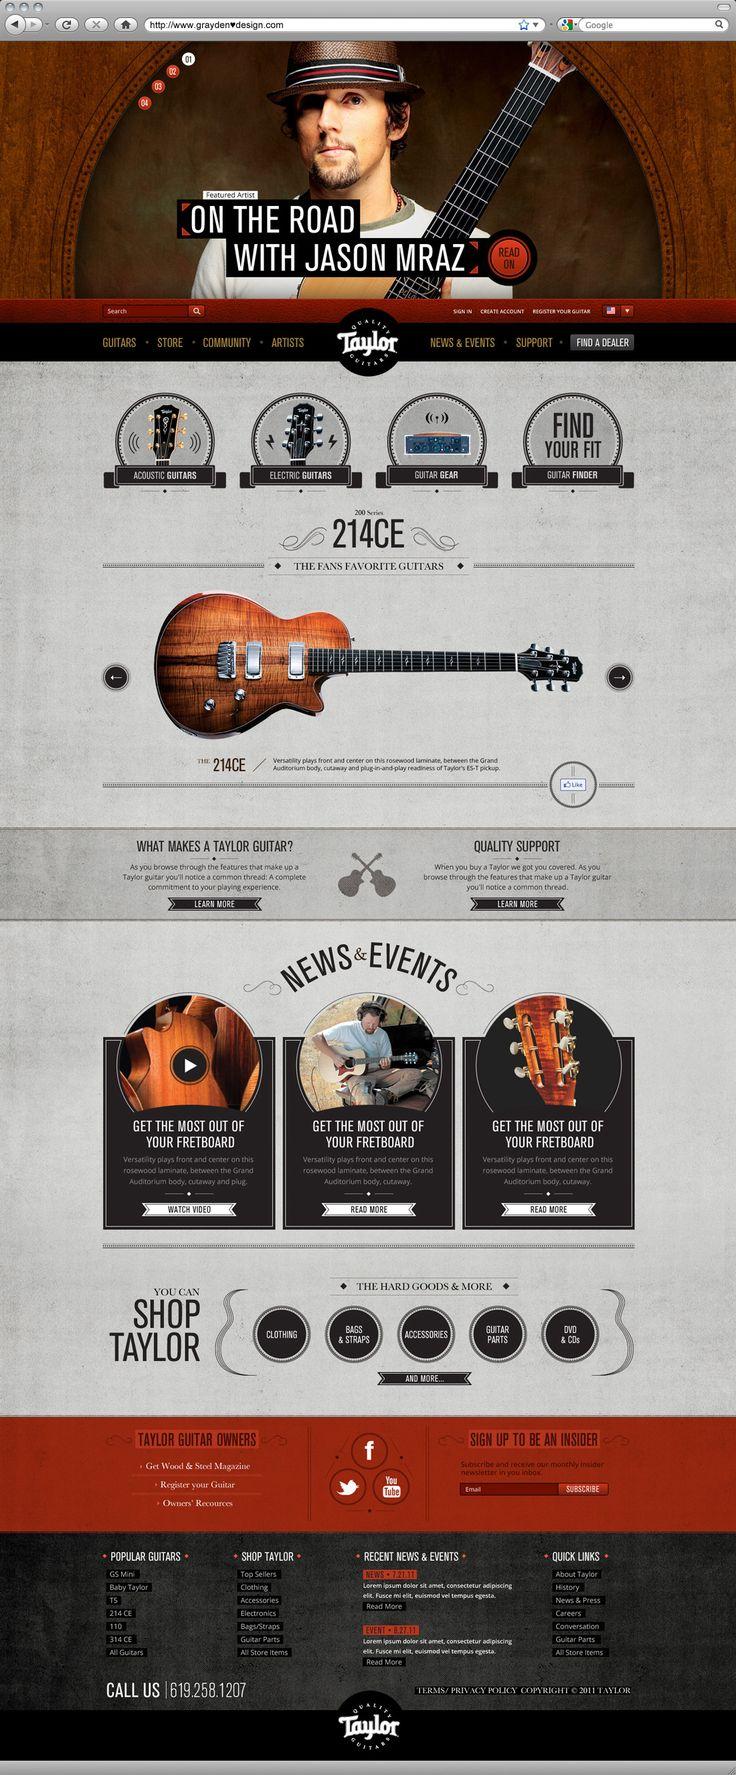 Taylor Guitars website Designed by Grayden Poper @ Digitaria